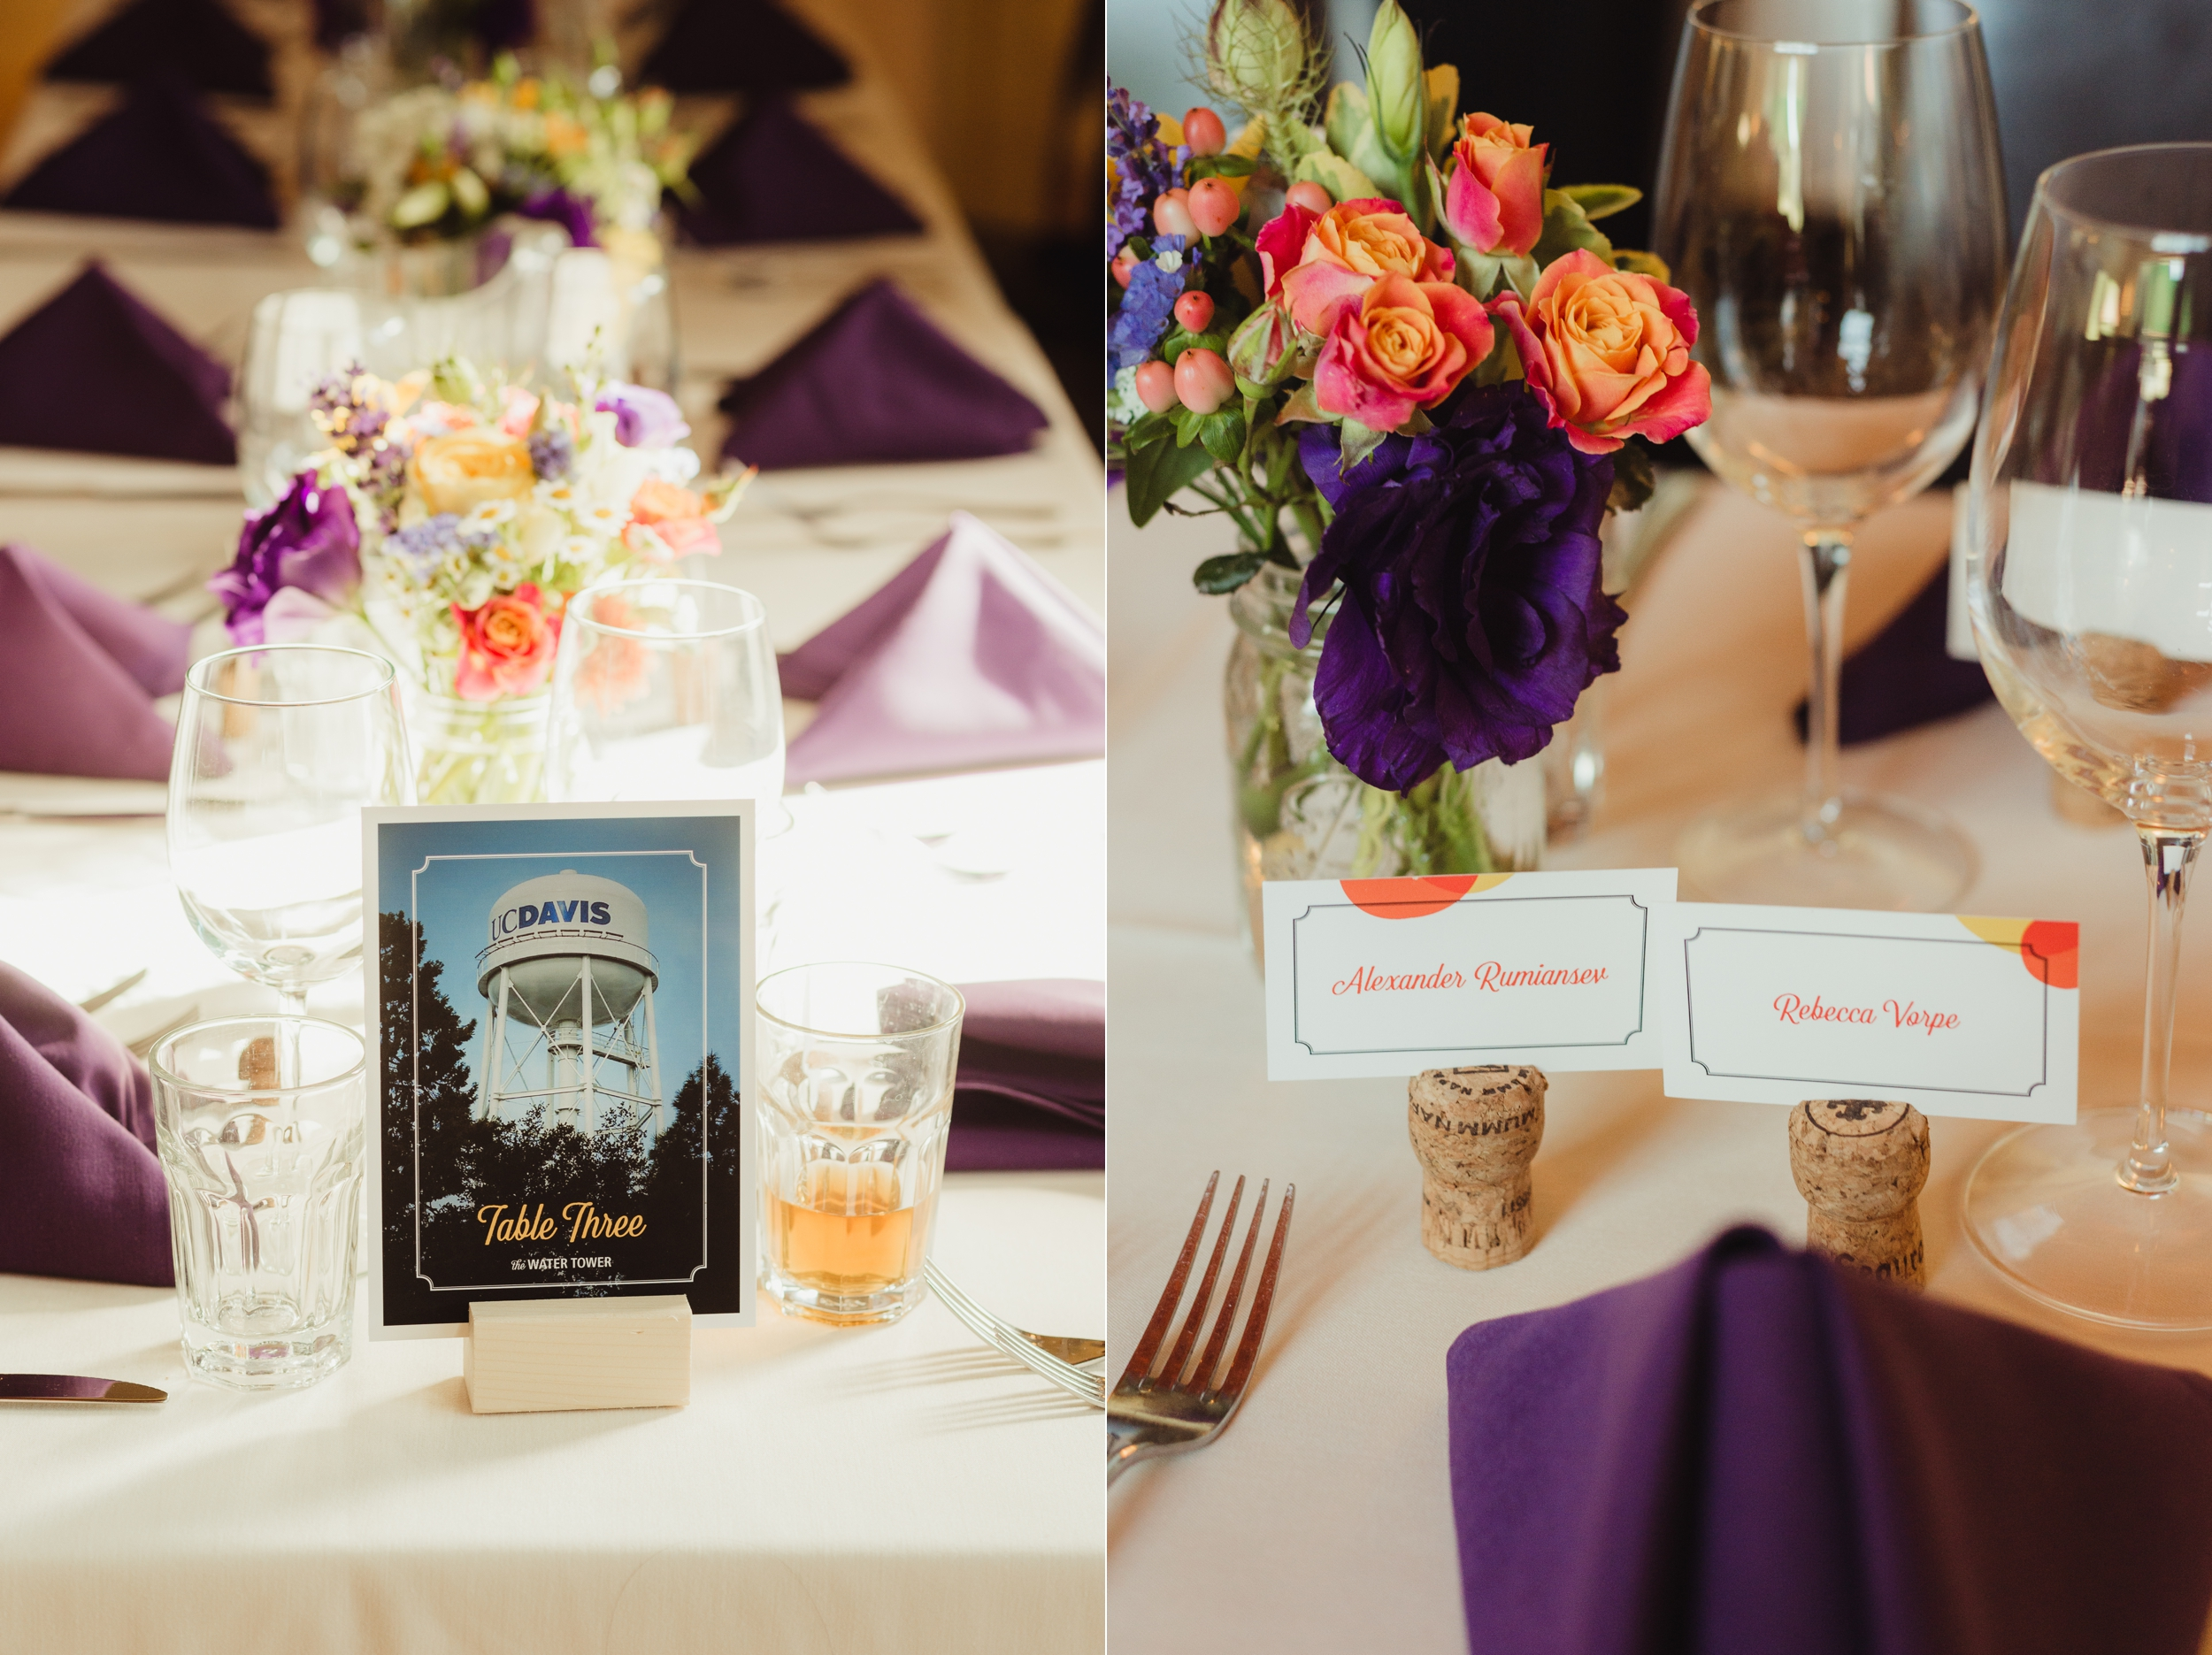 063-highland-dell-lodge-russian-river-wedding-vivianchen-044_WEB.jpg